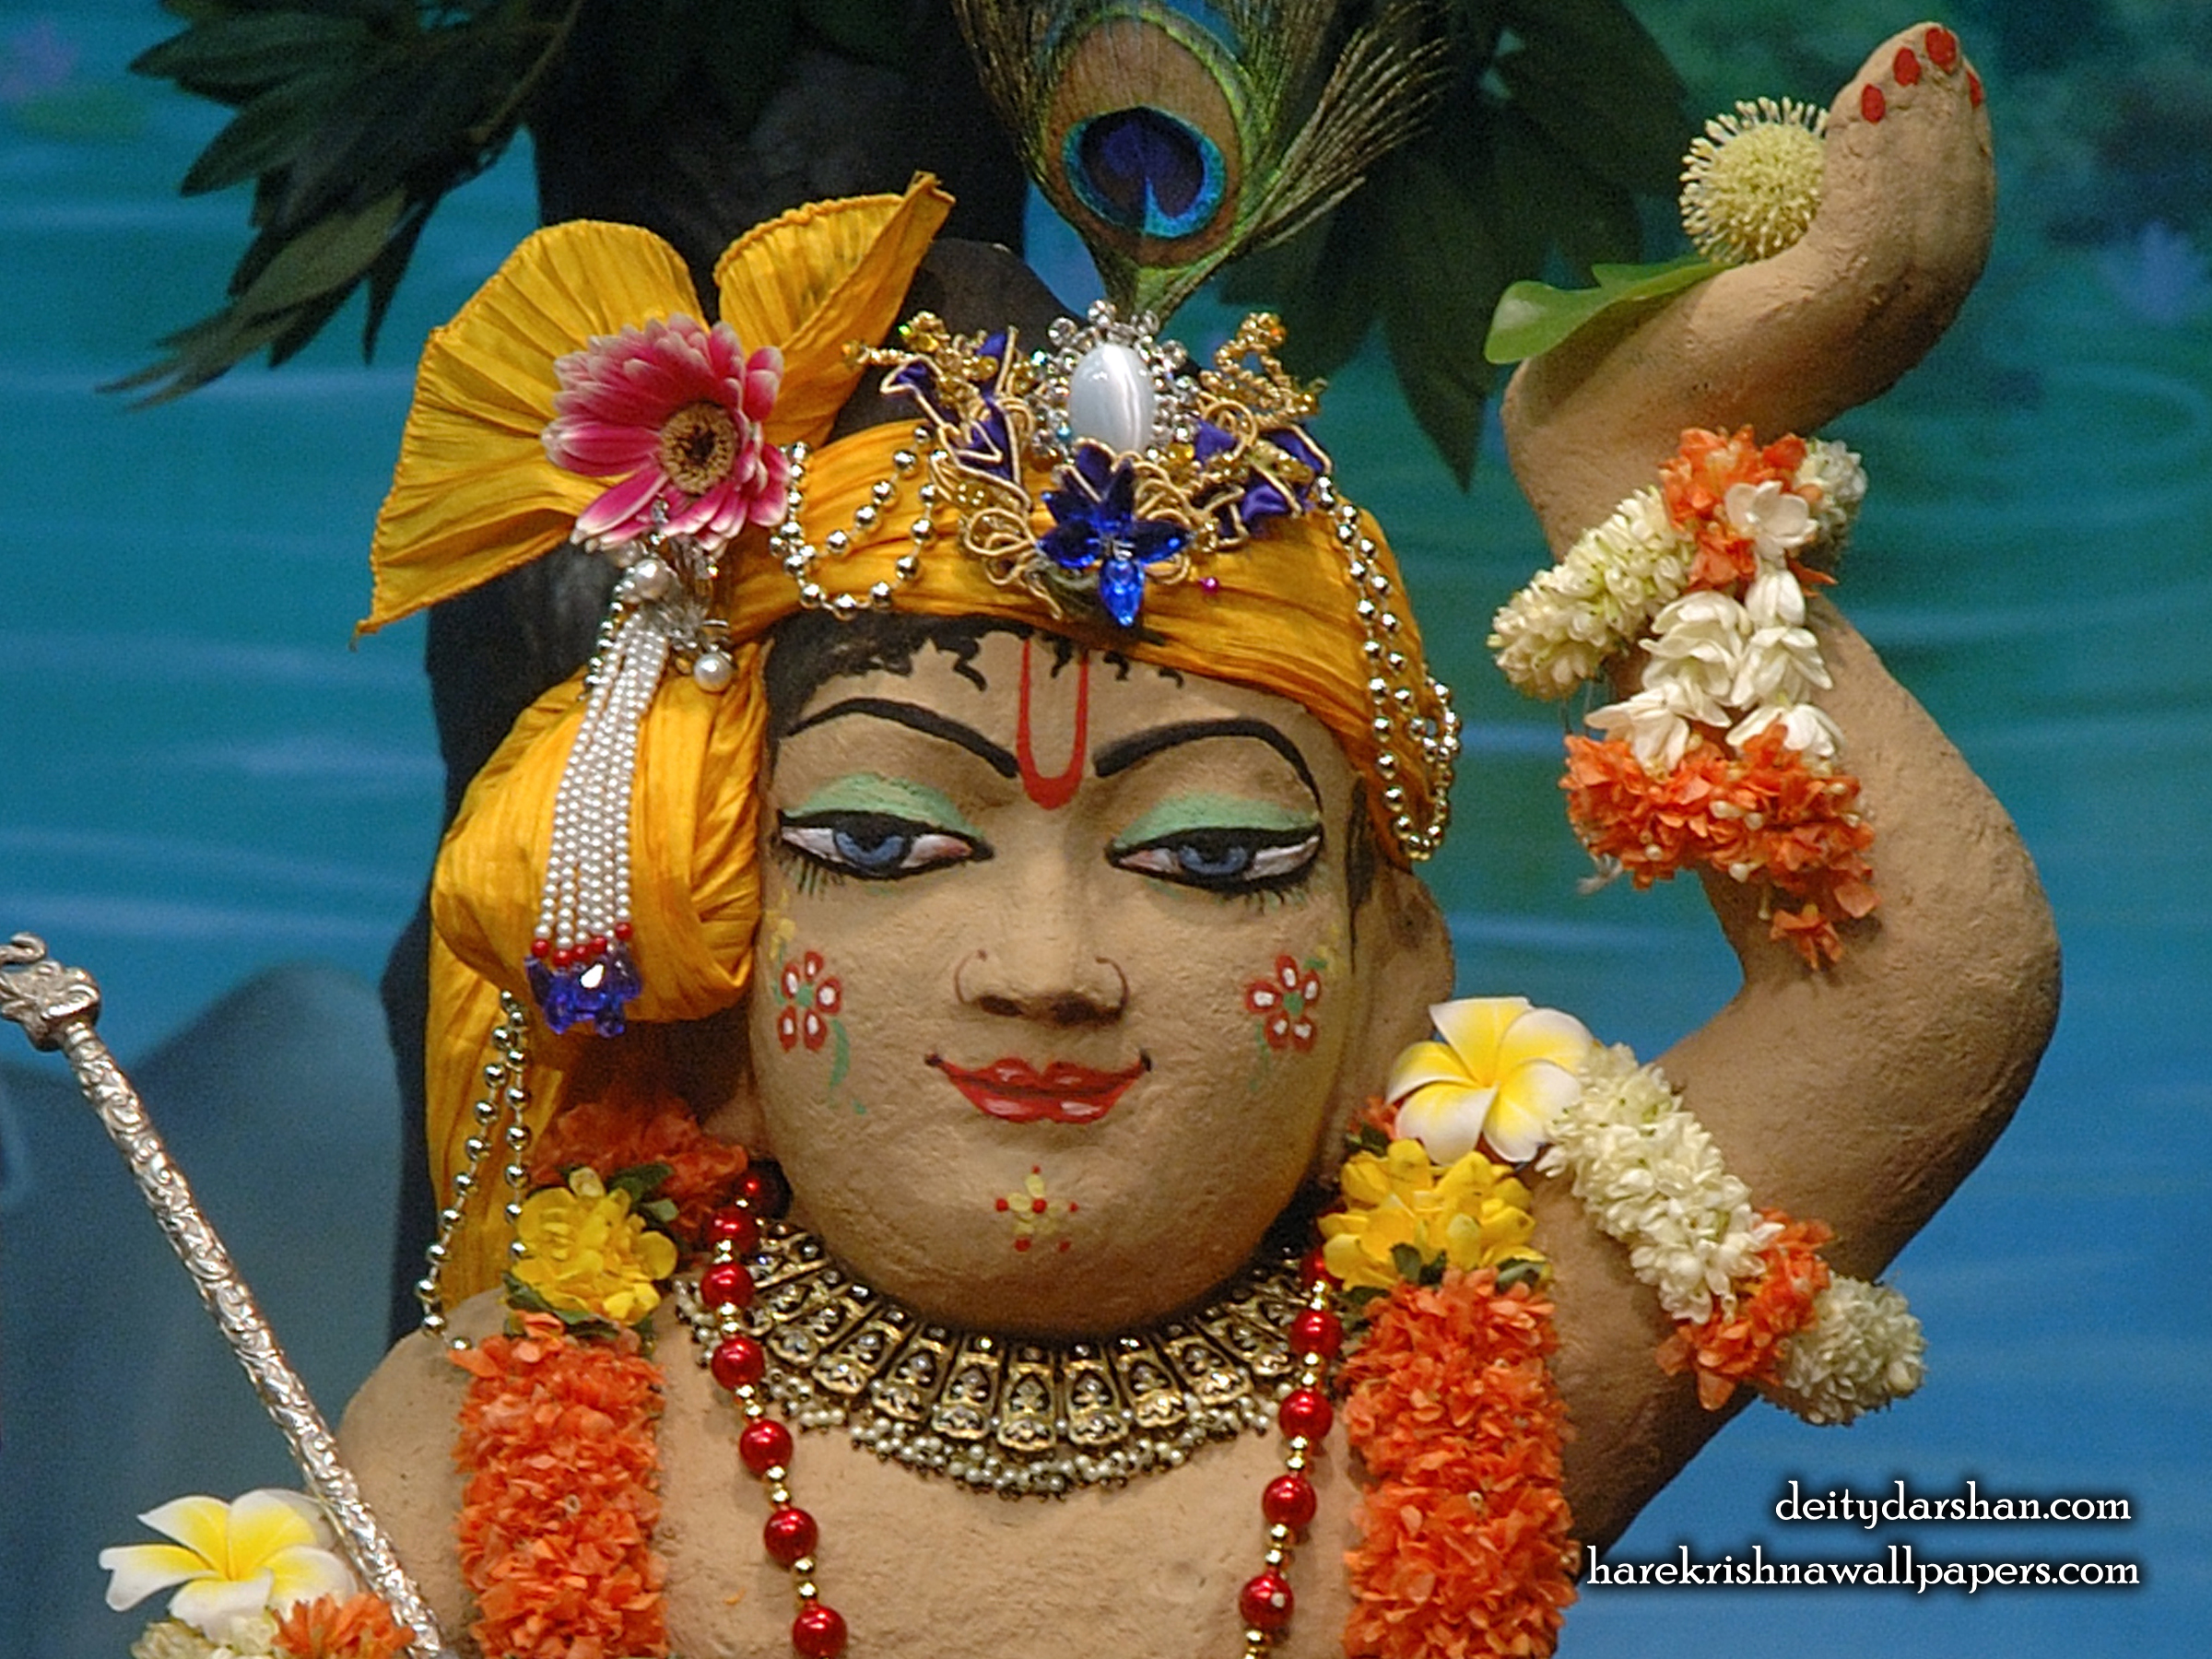 Sri Gopal Close up Wallpaper (039) Size 2400x1800 Download